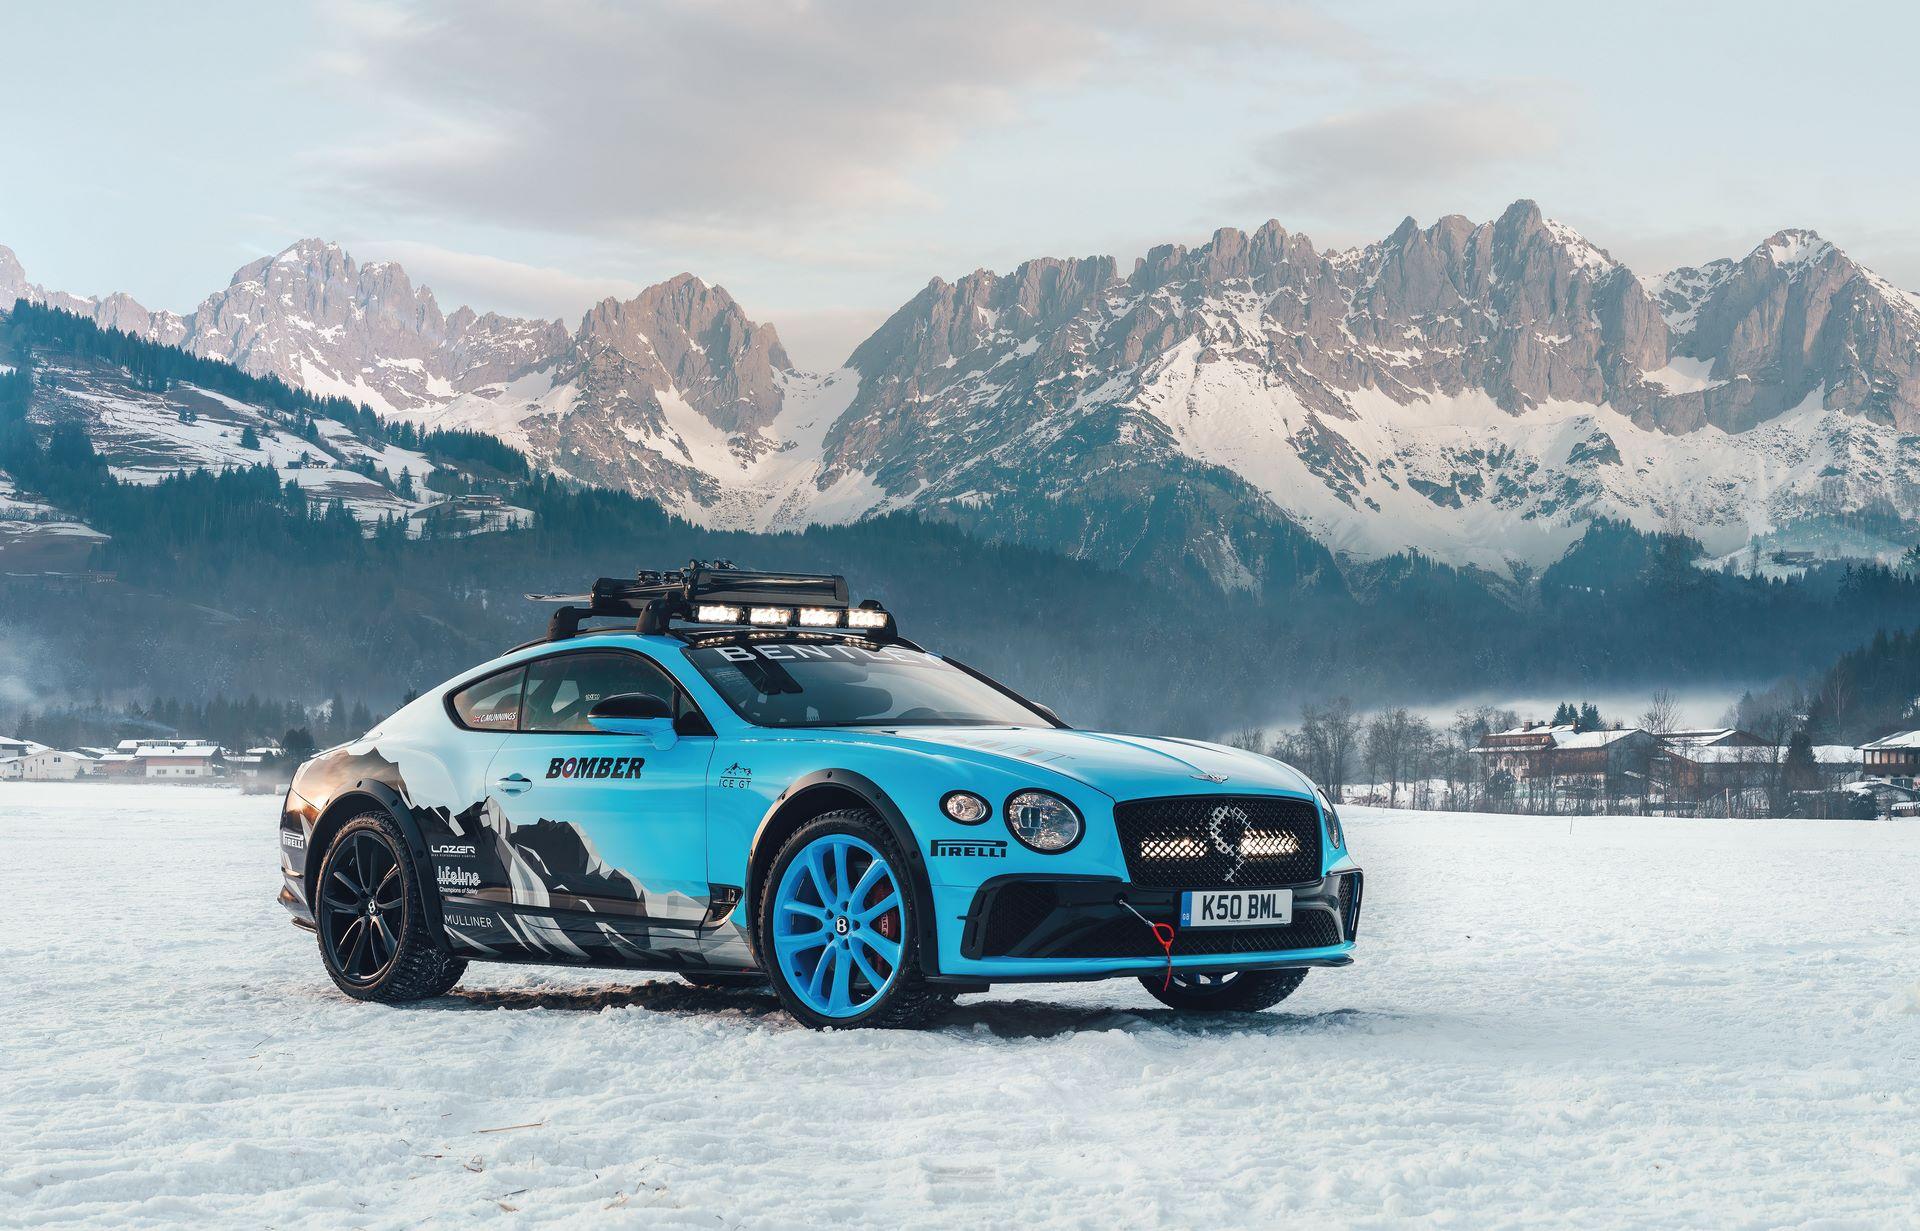 Bentley-Continental-GT-Ice-Race-2020-1